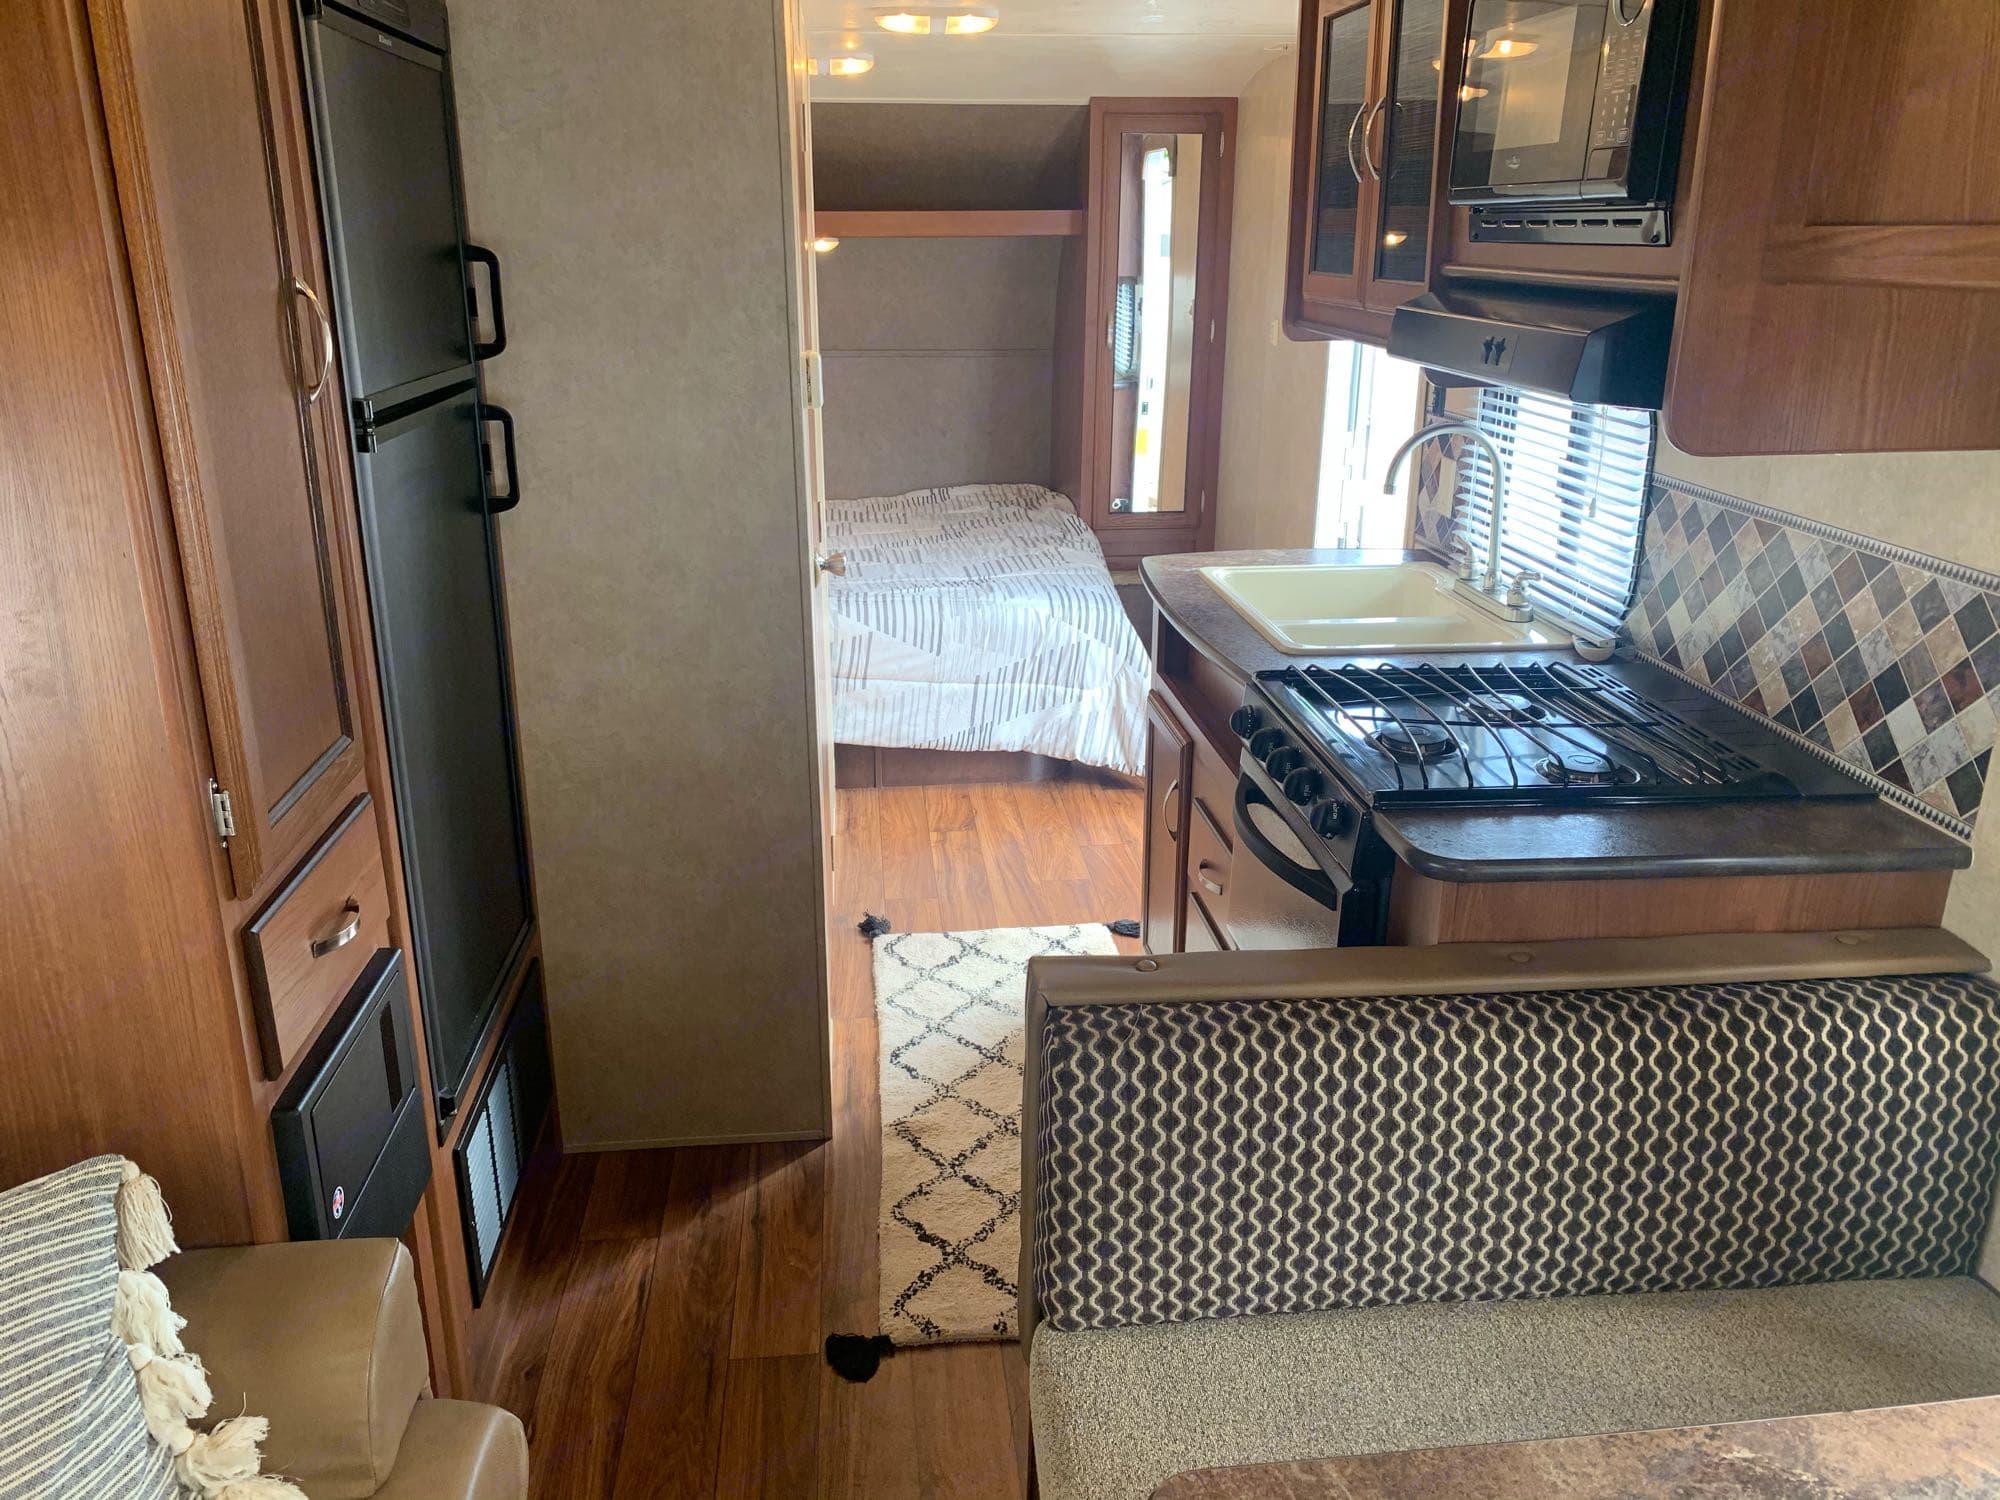 kitchen area. Forest River Salem Cruise Lite 2016